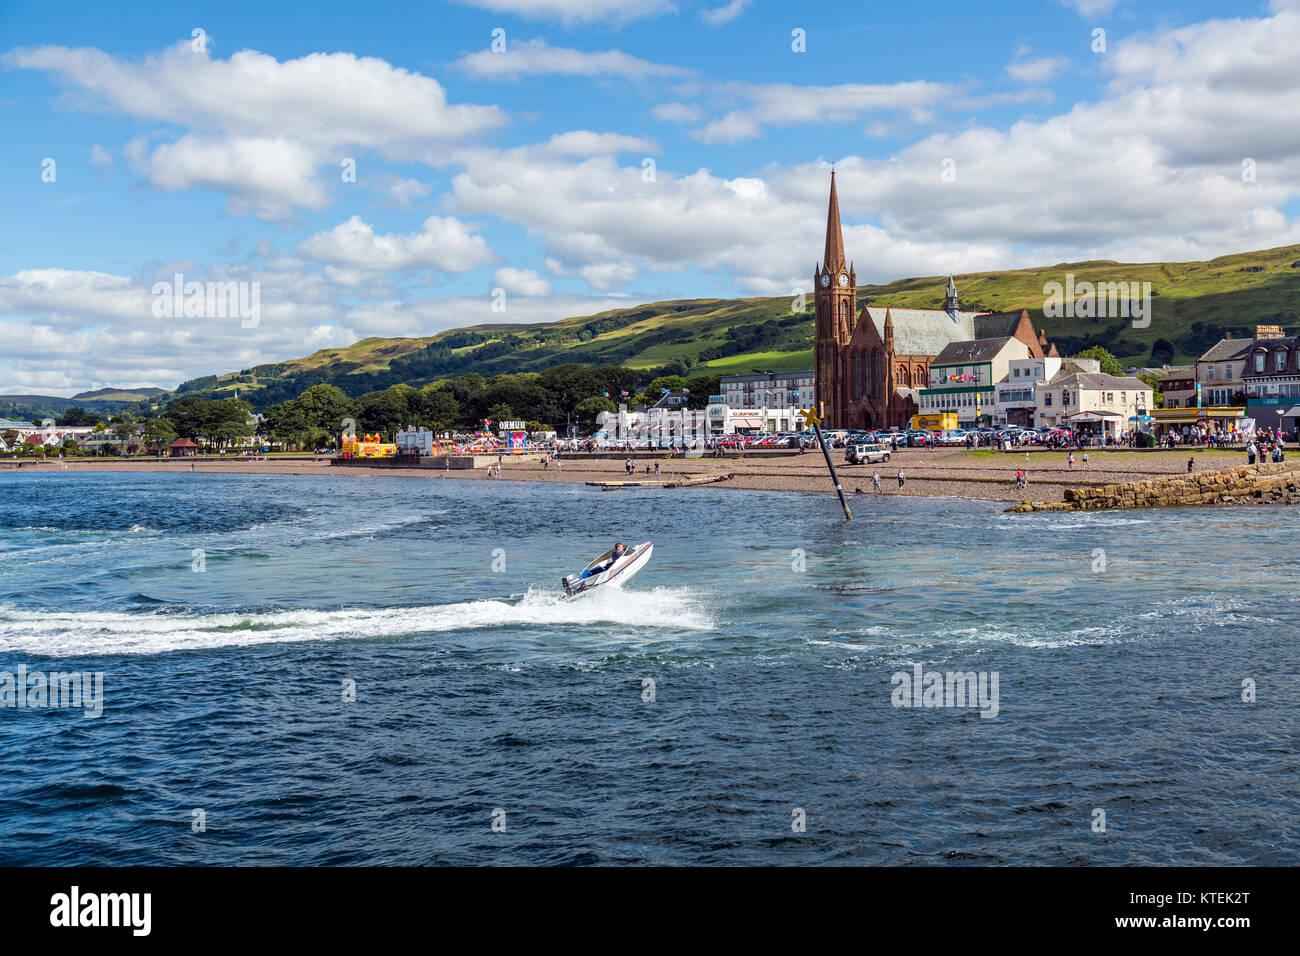 Largs seafront, North Ayrshire, Scotland, UK - Stock Image